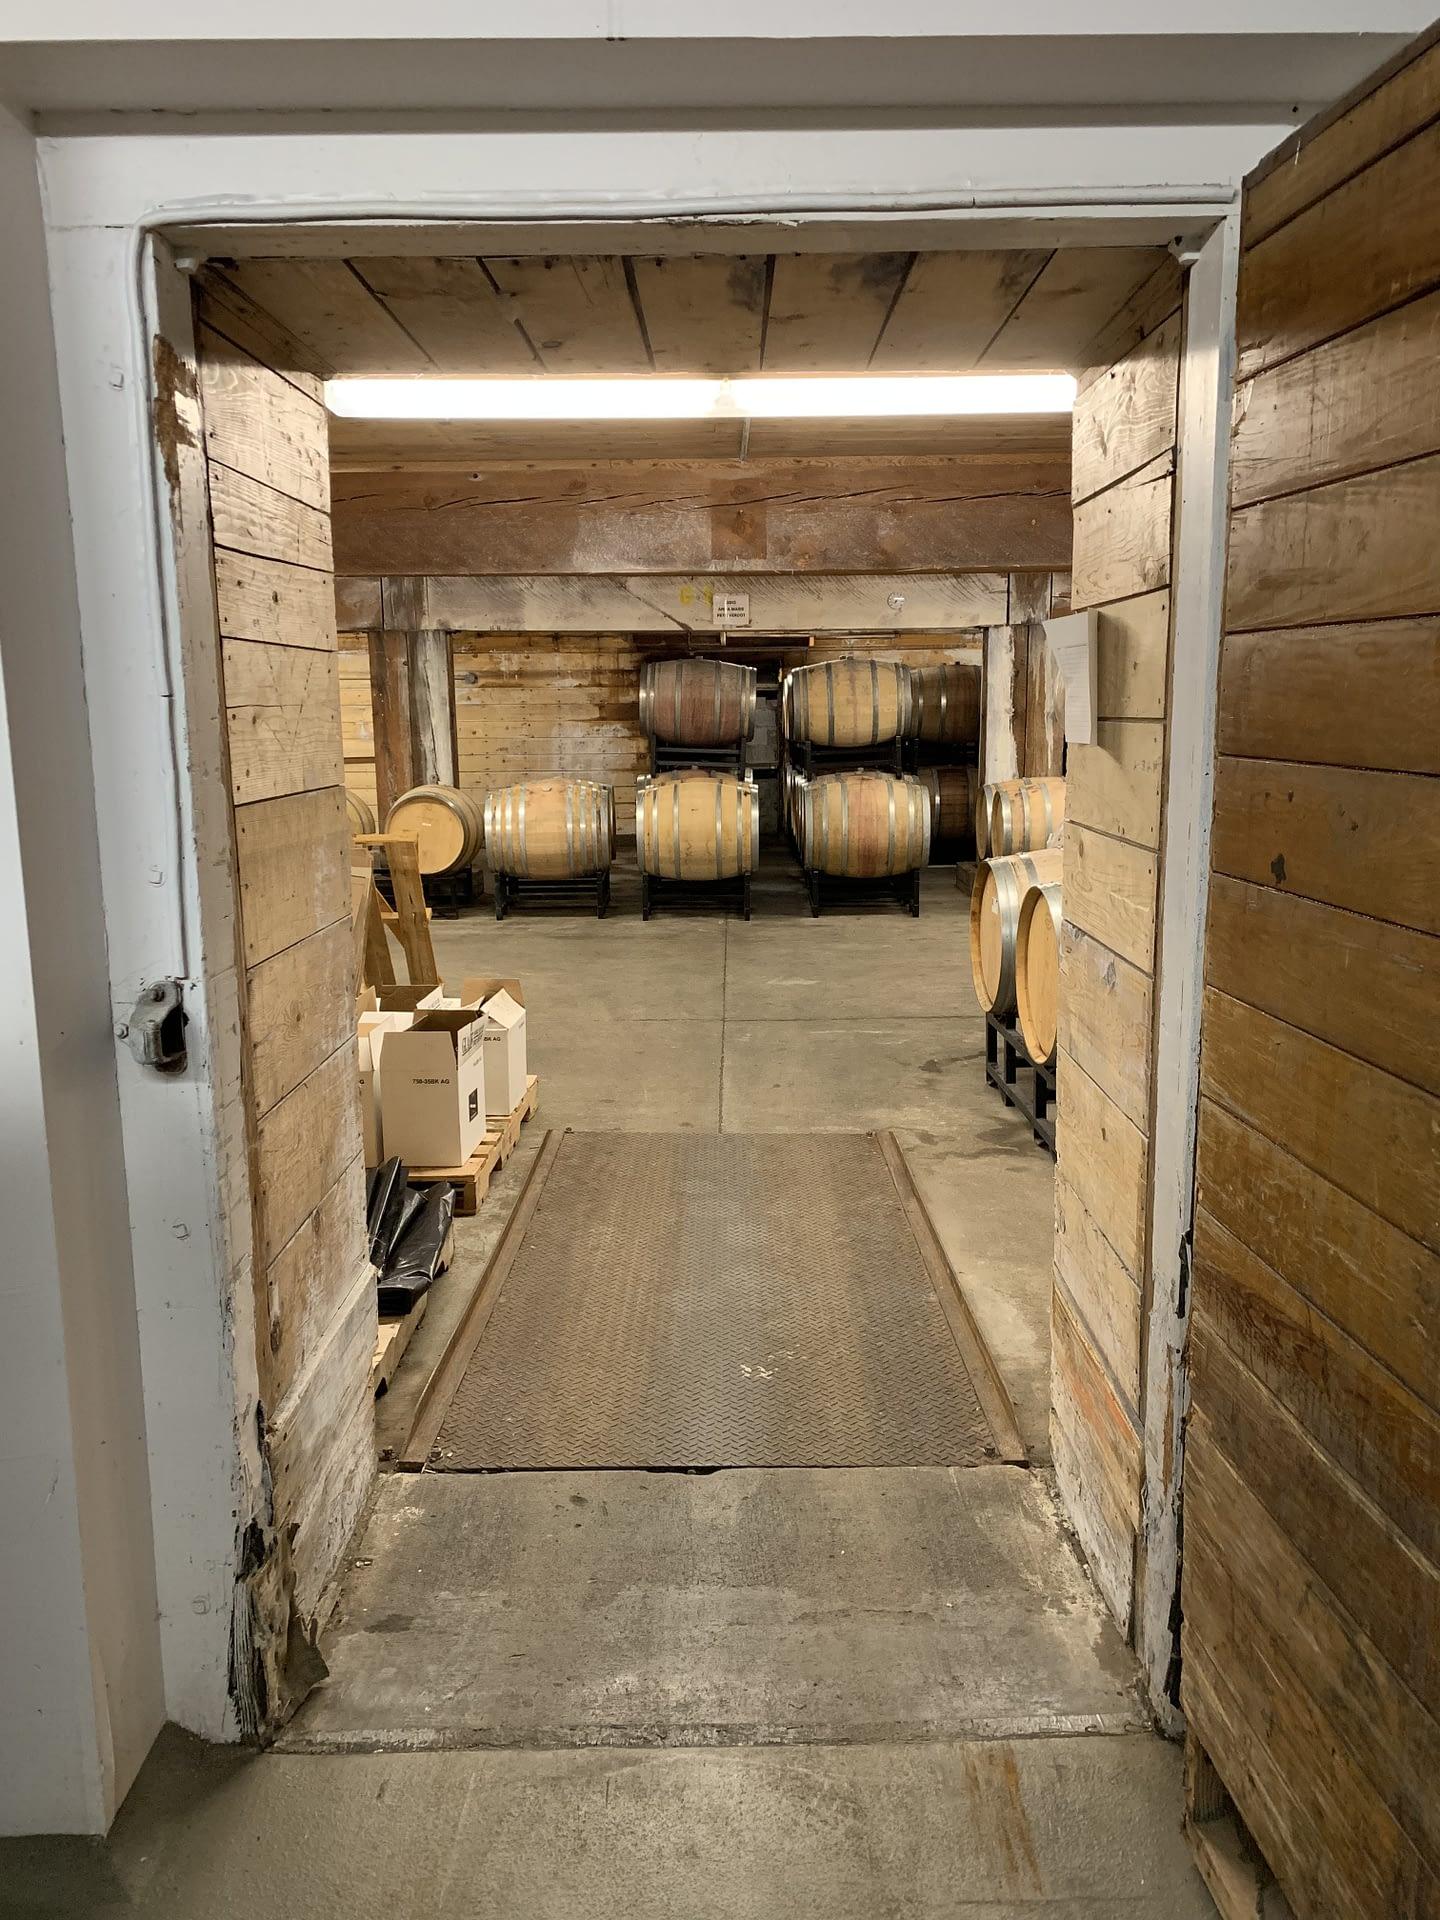 Wine barrels in a a row at Zerba Wine Cellars in Walla Walla Valley Milton-Freewater, Oregon